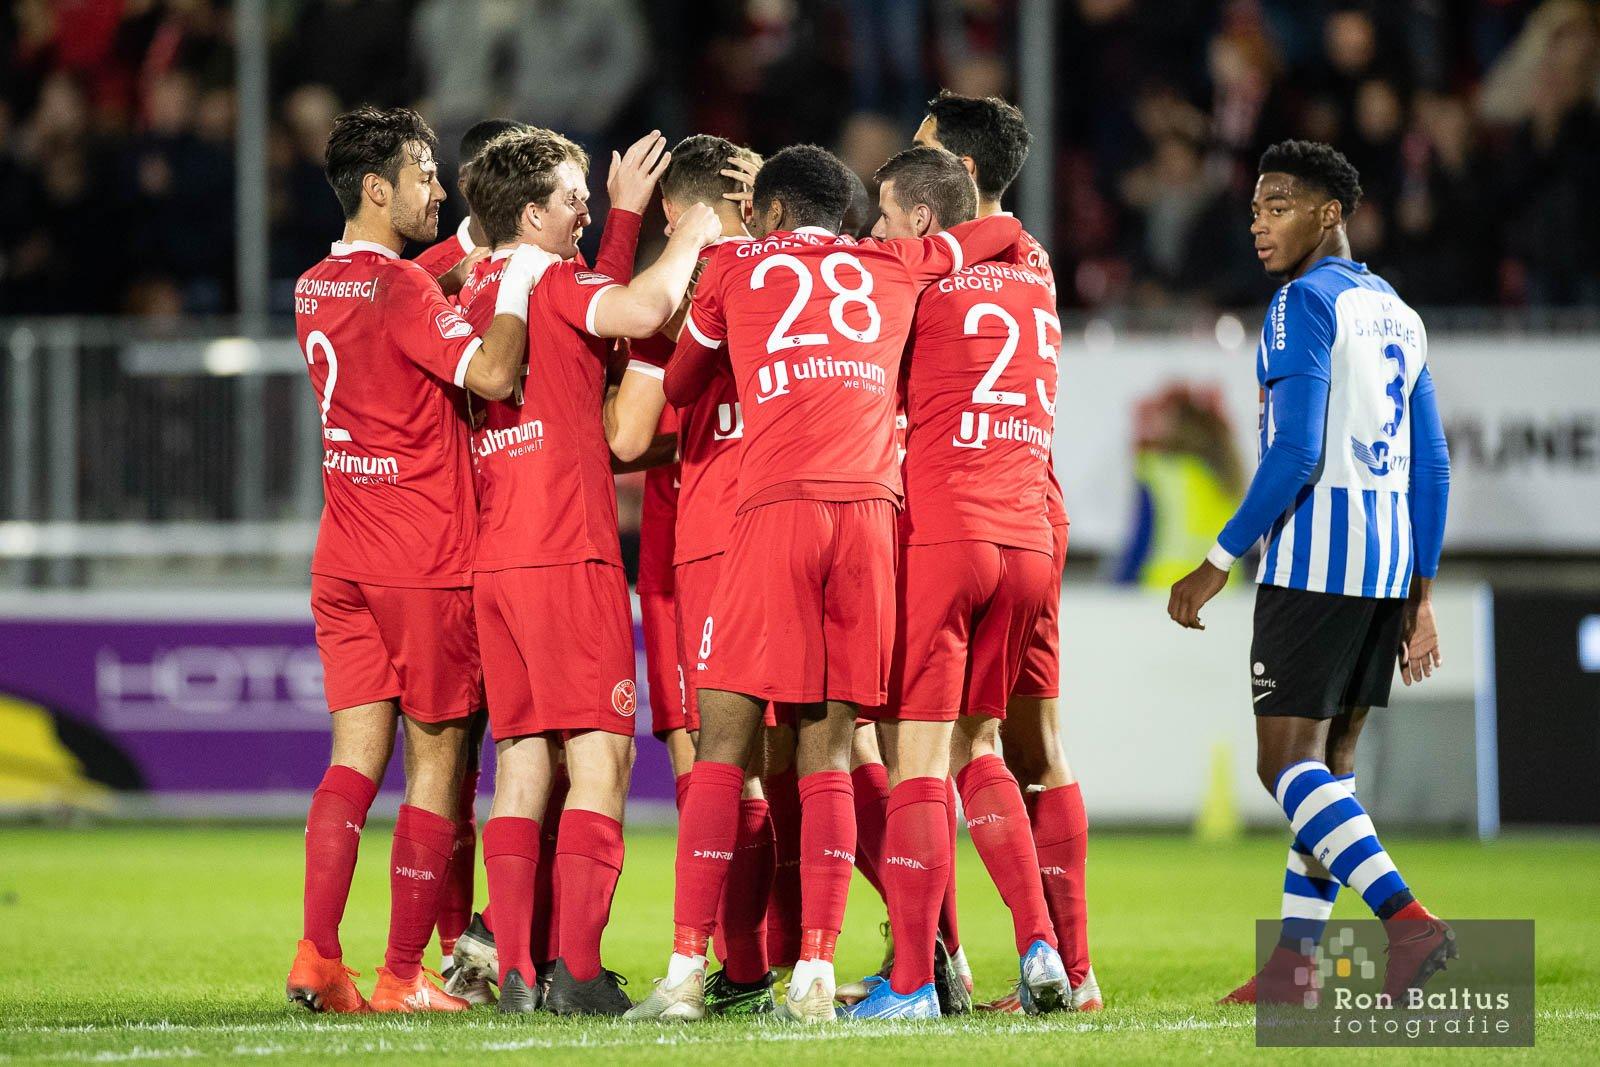 Almere City FC verslaat FC Eindhoven in slotfase